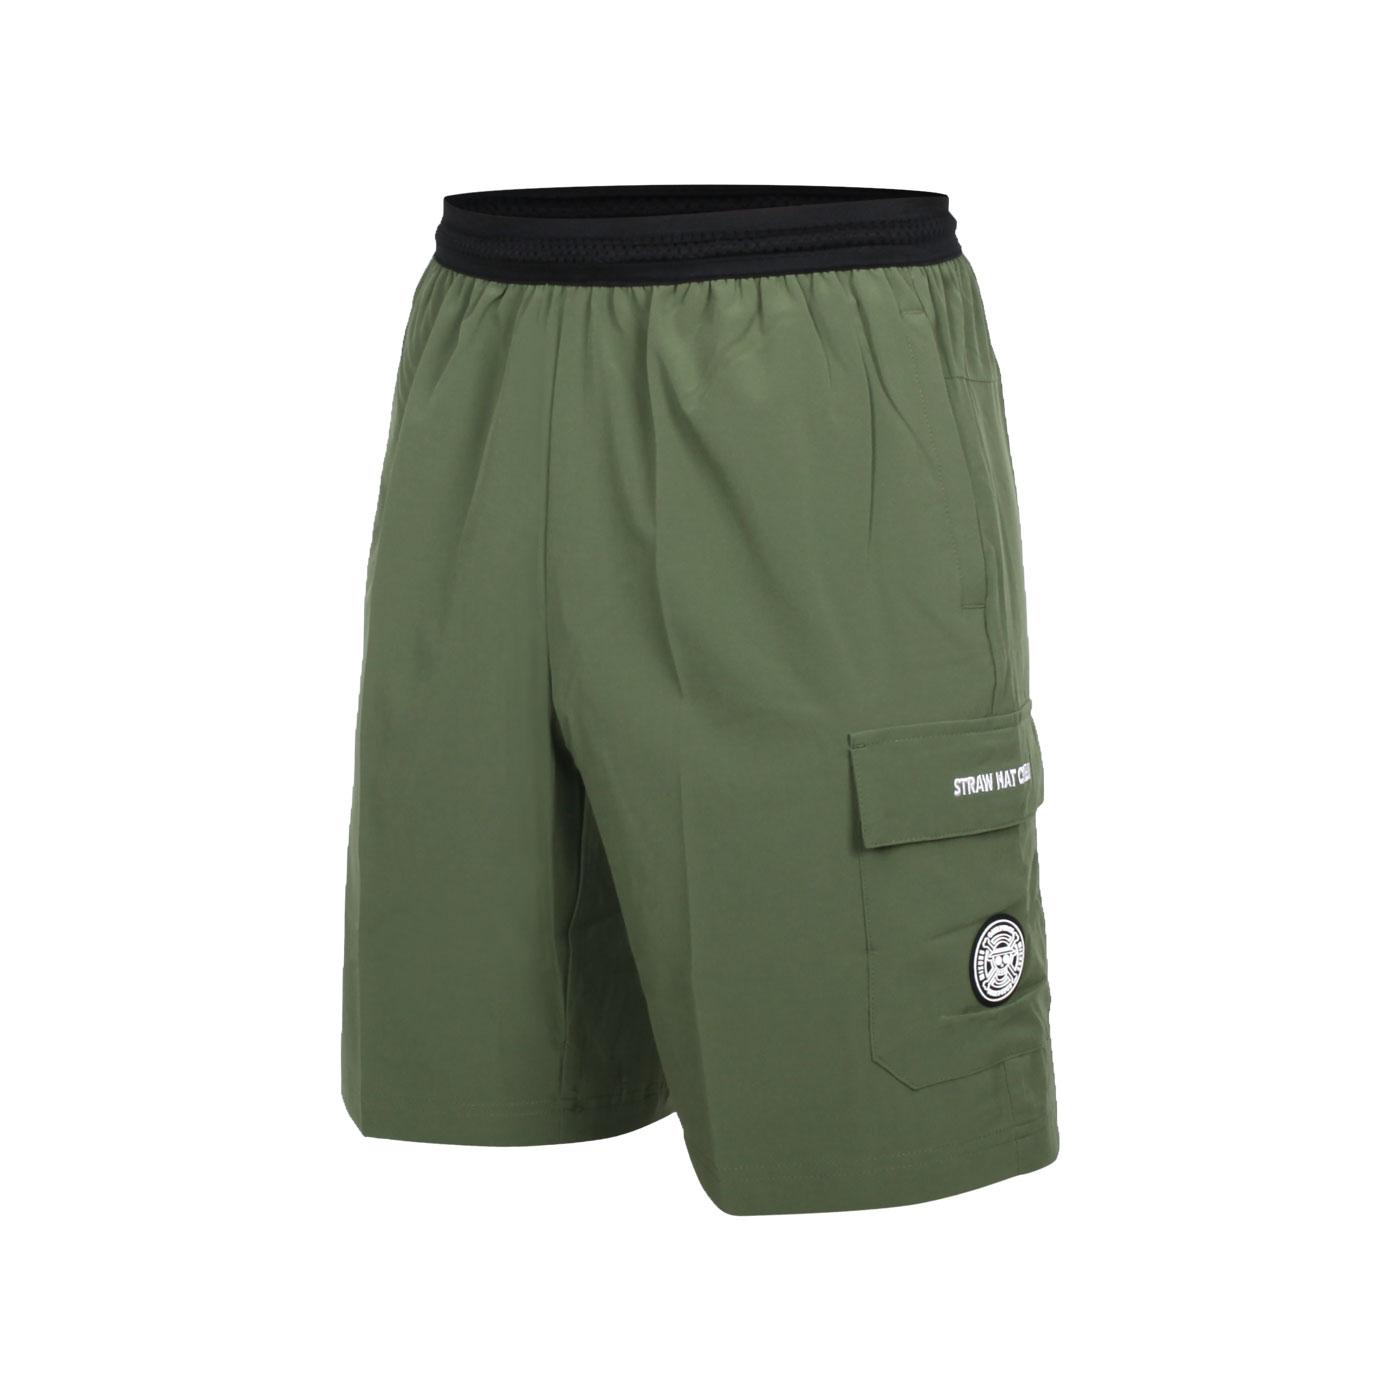 MIZUNO 男平織短褲(海賊王聯名款) D2TB155739 - 軍綠黑